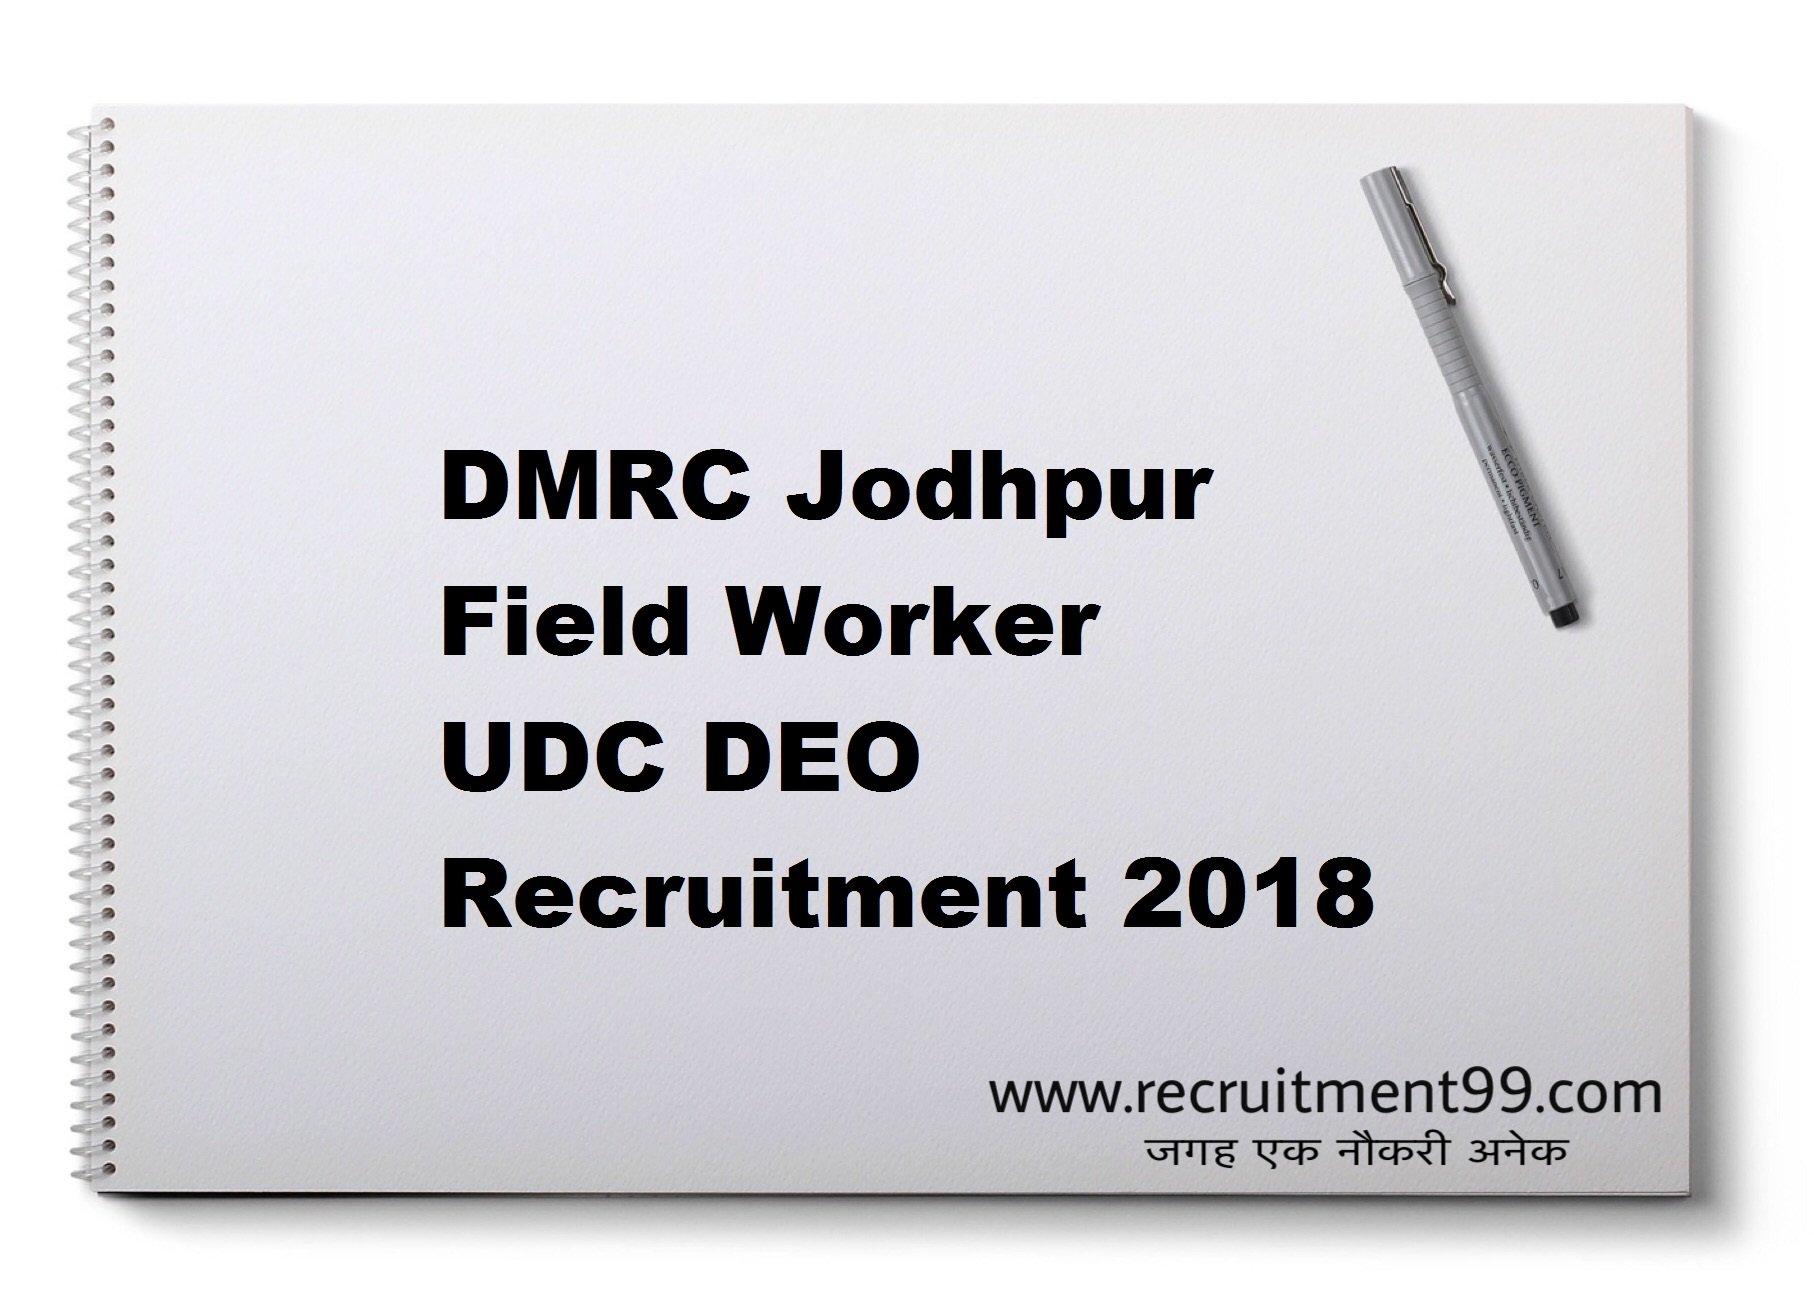 DMRC Jodhpur Field Worker UDC DEO Recruitment Admit Card Result 2018